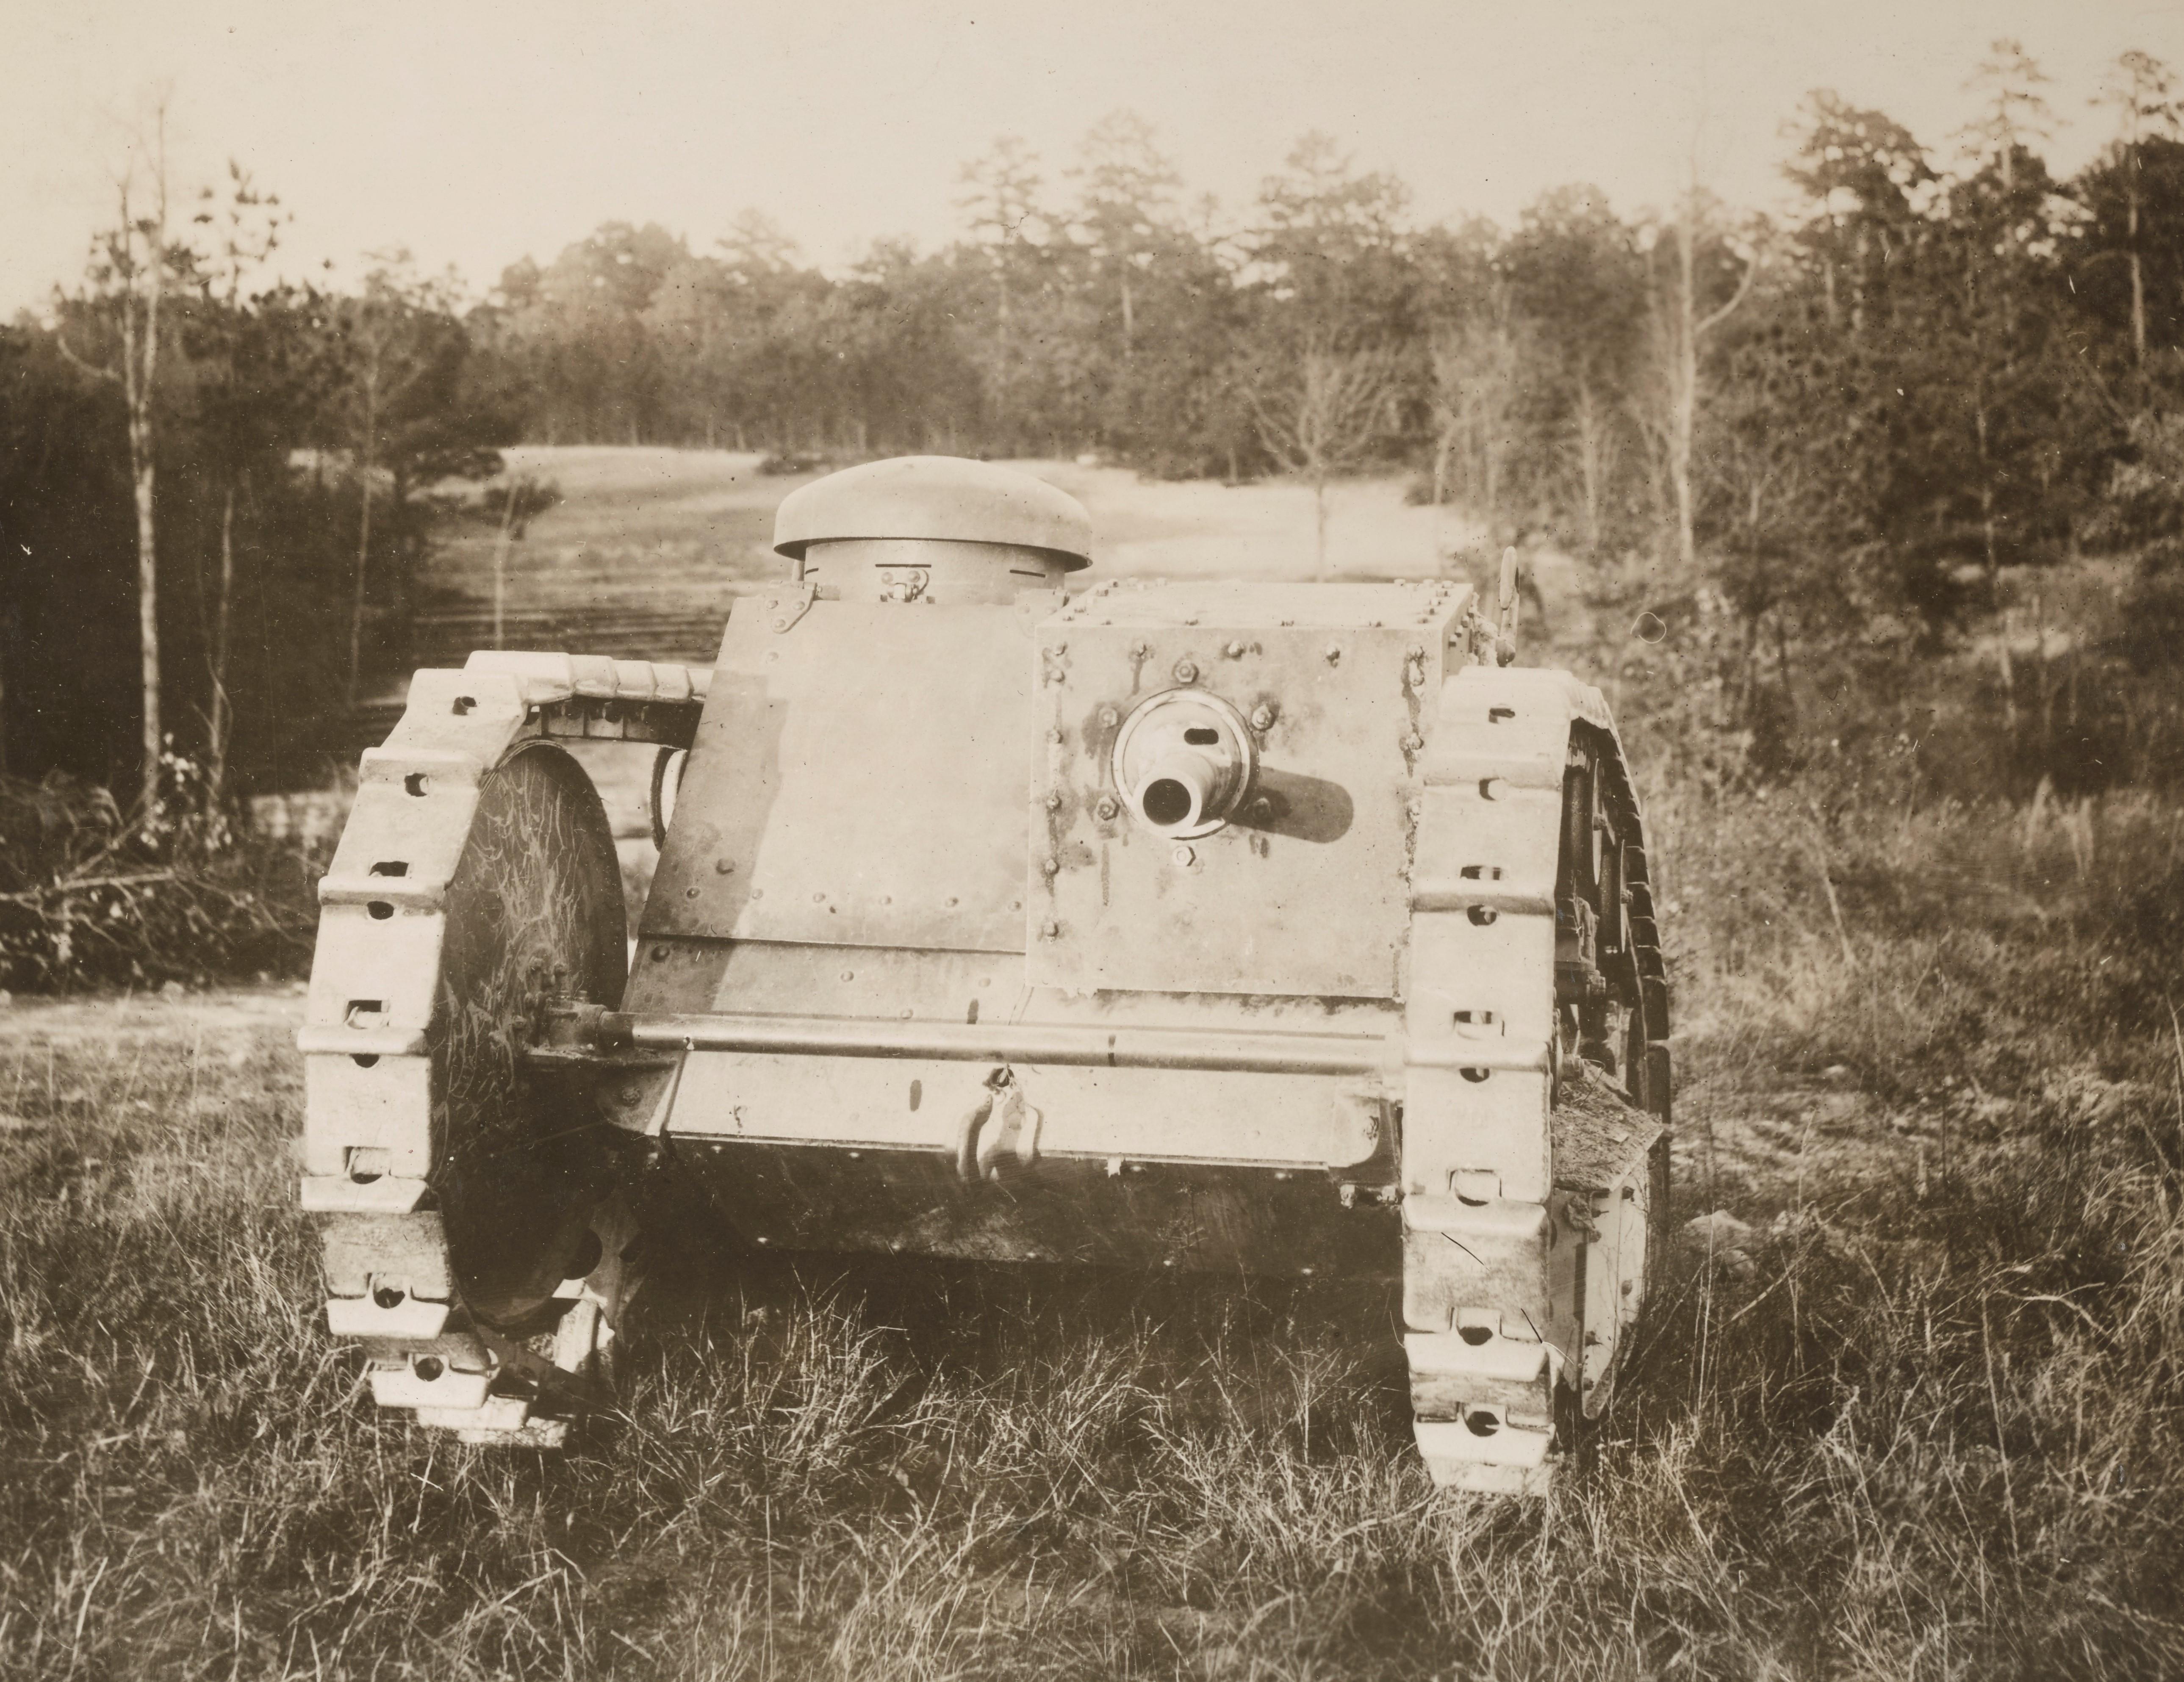 165-WW-319A-078.jpg